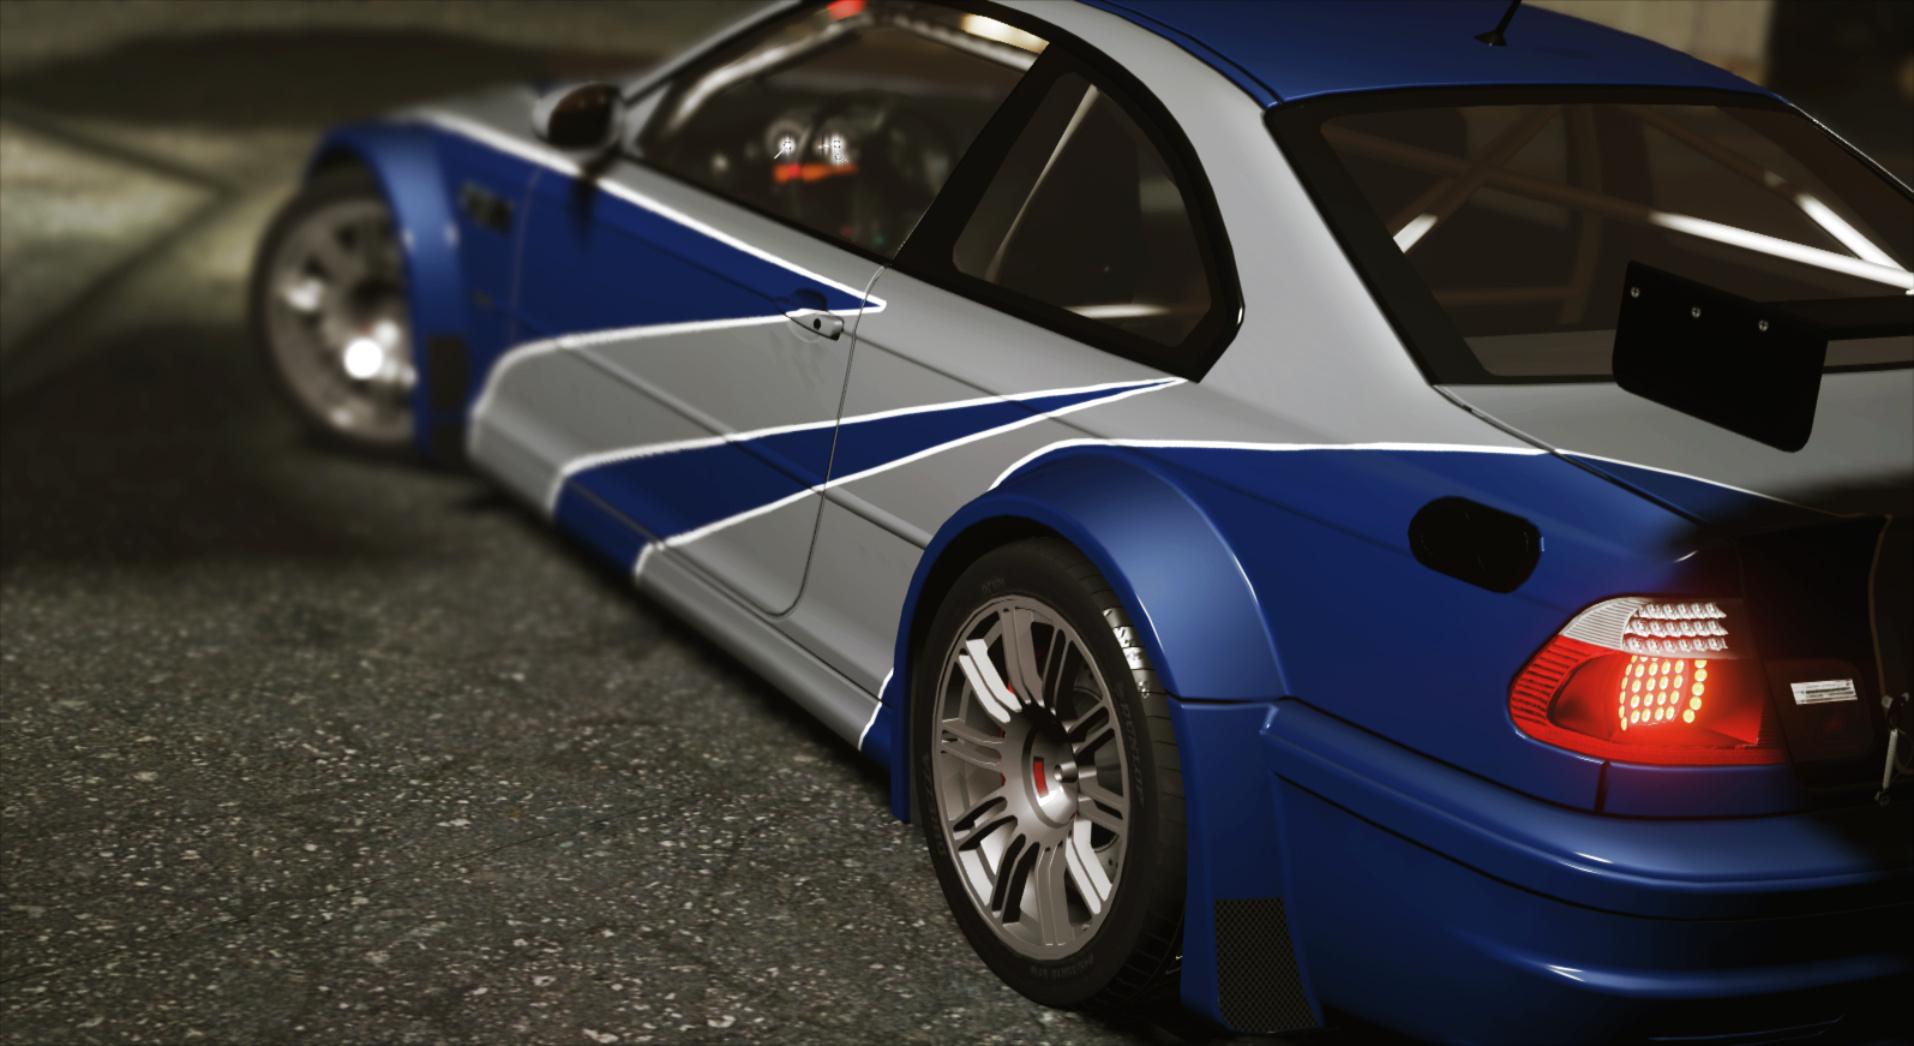 BMW M3 GTR E46 NFS MW [4k livery] [Add-On] - GTA5-Mods com